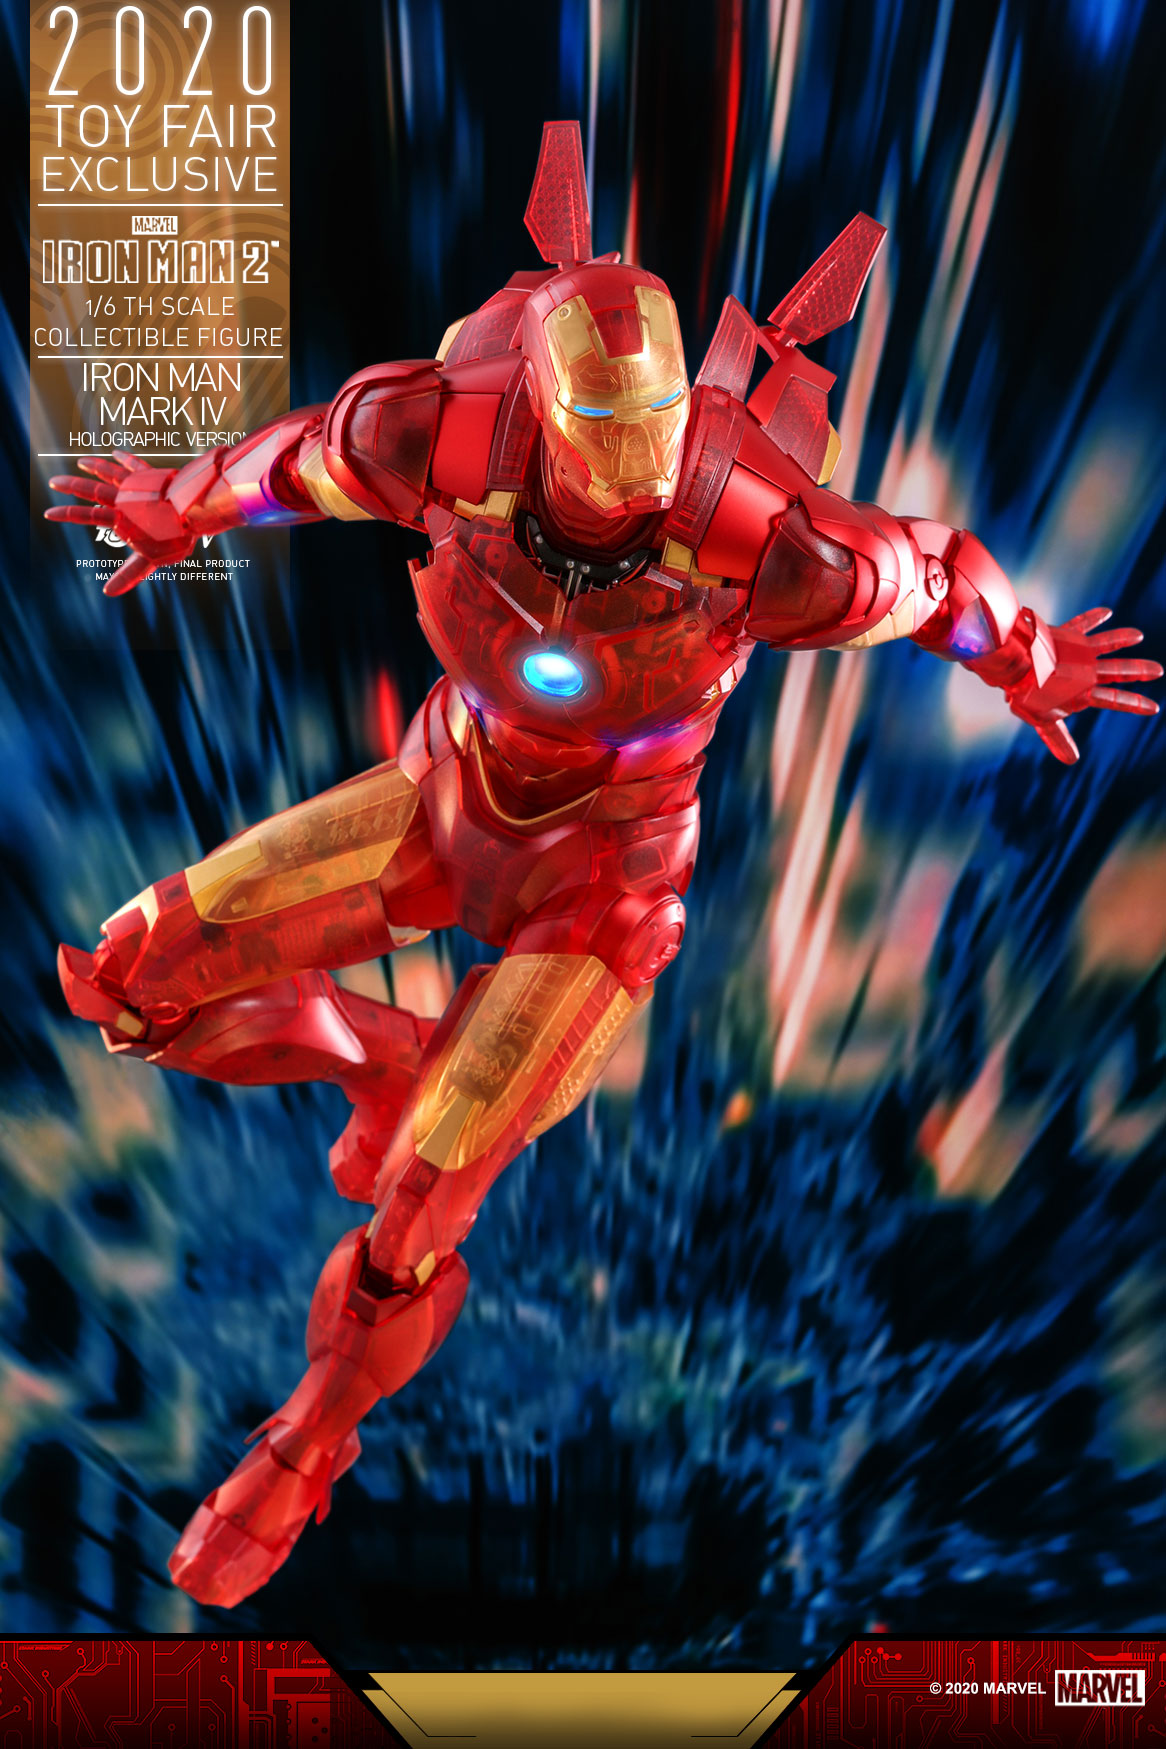 Hot Toys - IM2 - Iron Man Mark IV (Holographic Version) collectible figure_PR6